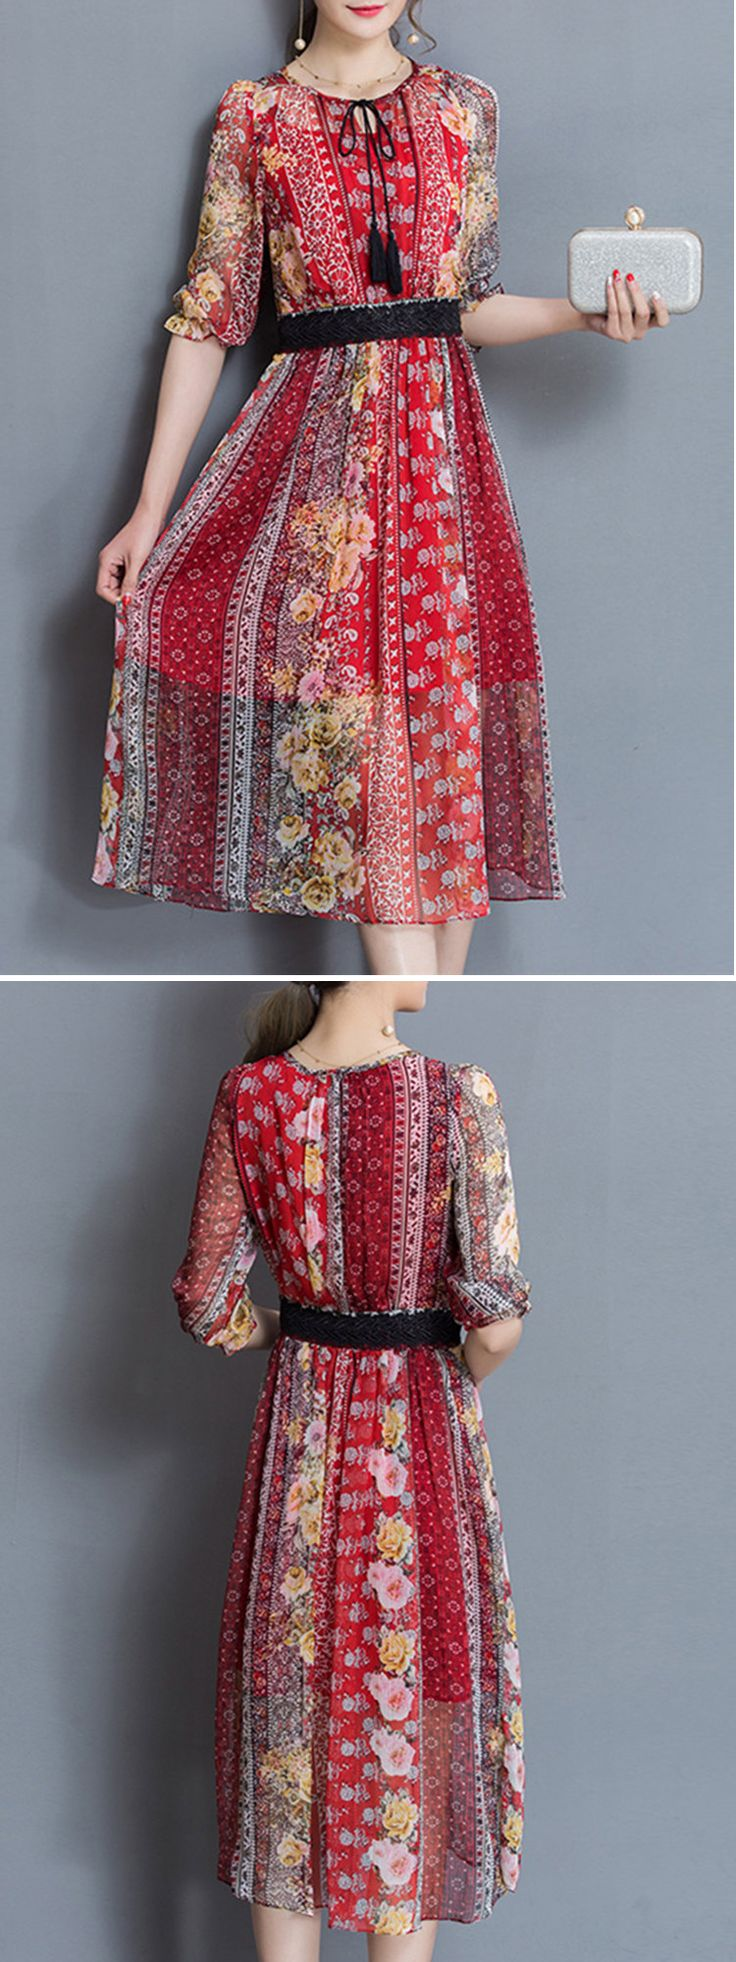 Elegant Women Floral Printed Chiffon Half Sleeve Dresses